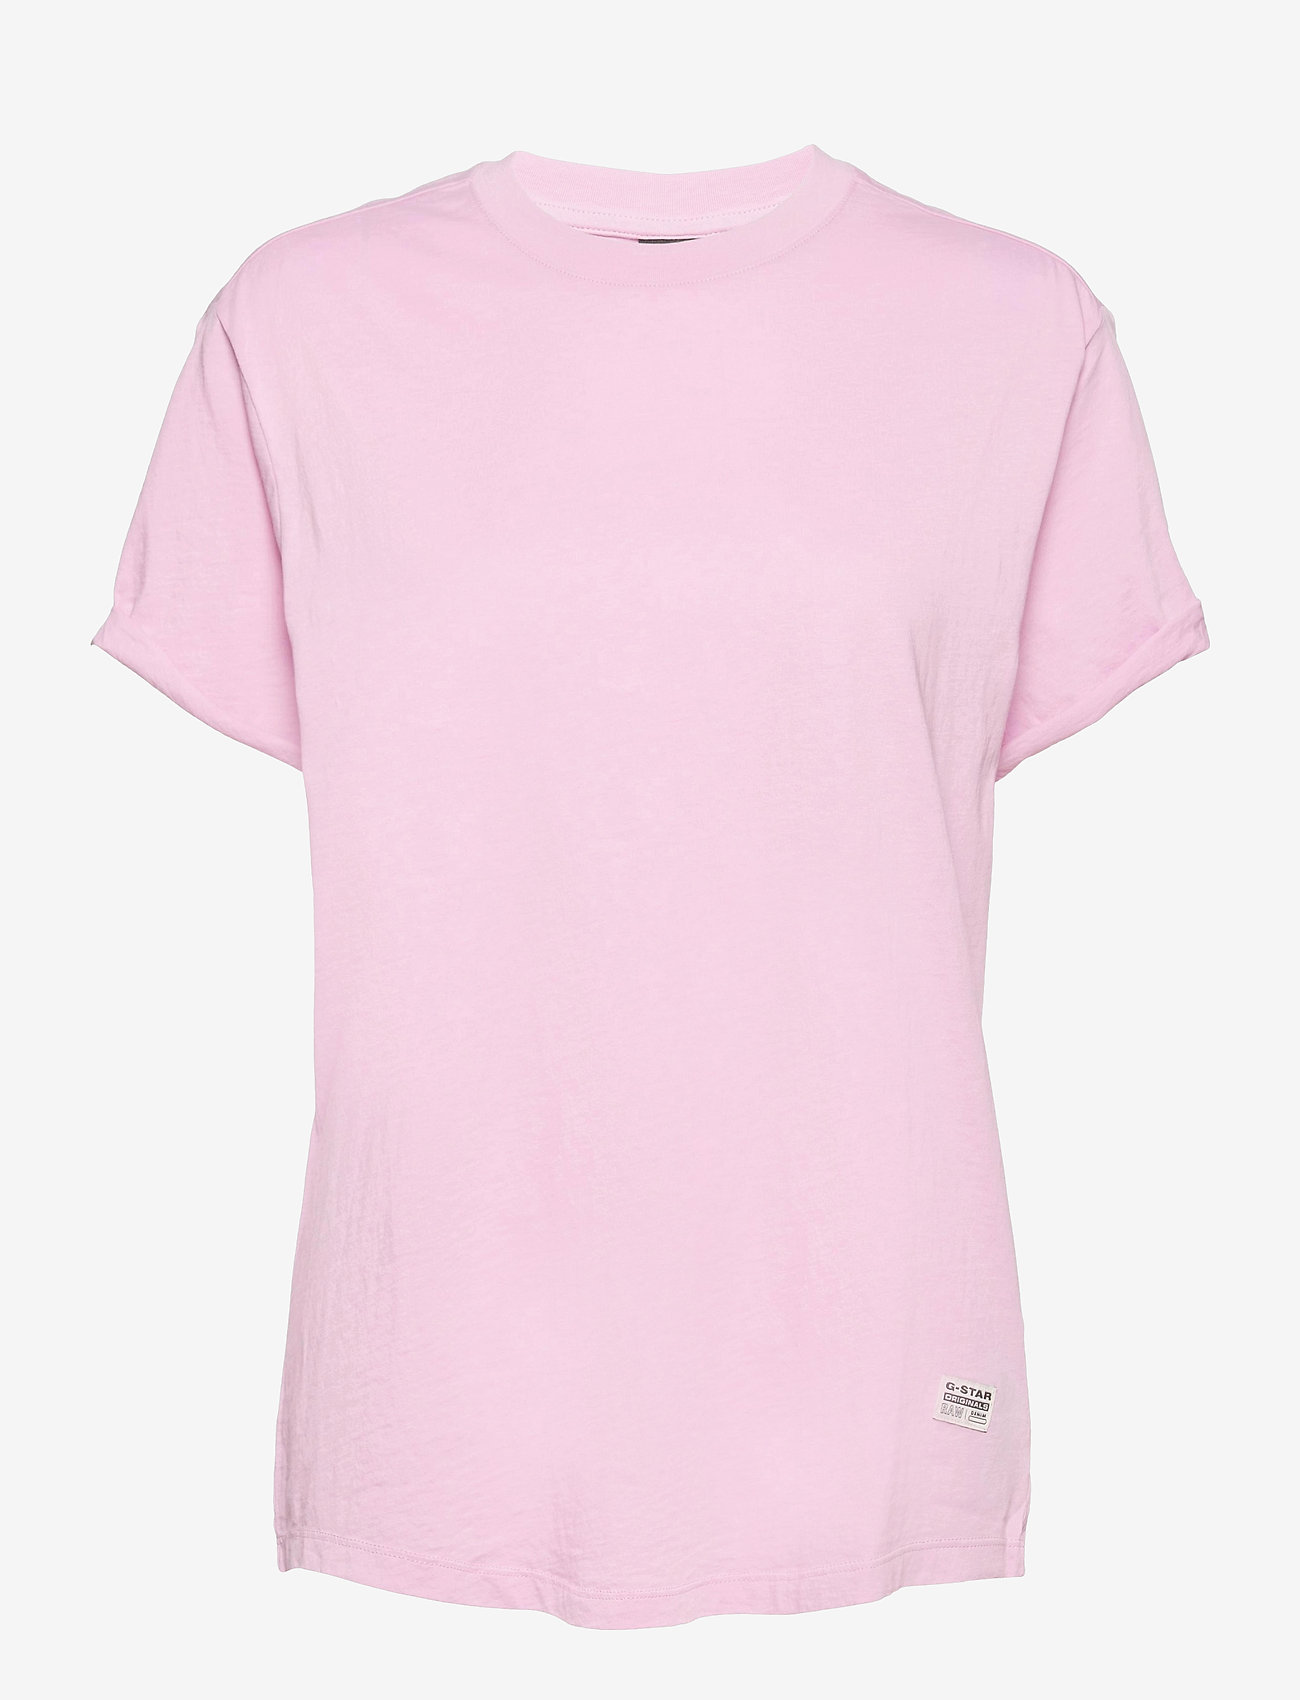 G-star RAW - Lash fem loose r t wmn s\s - t-shirts - lavender pink - 0